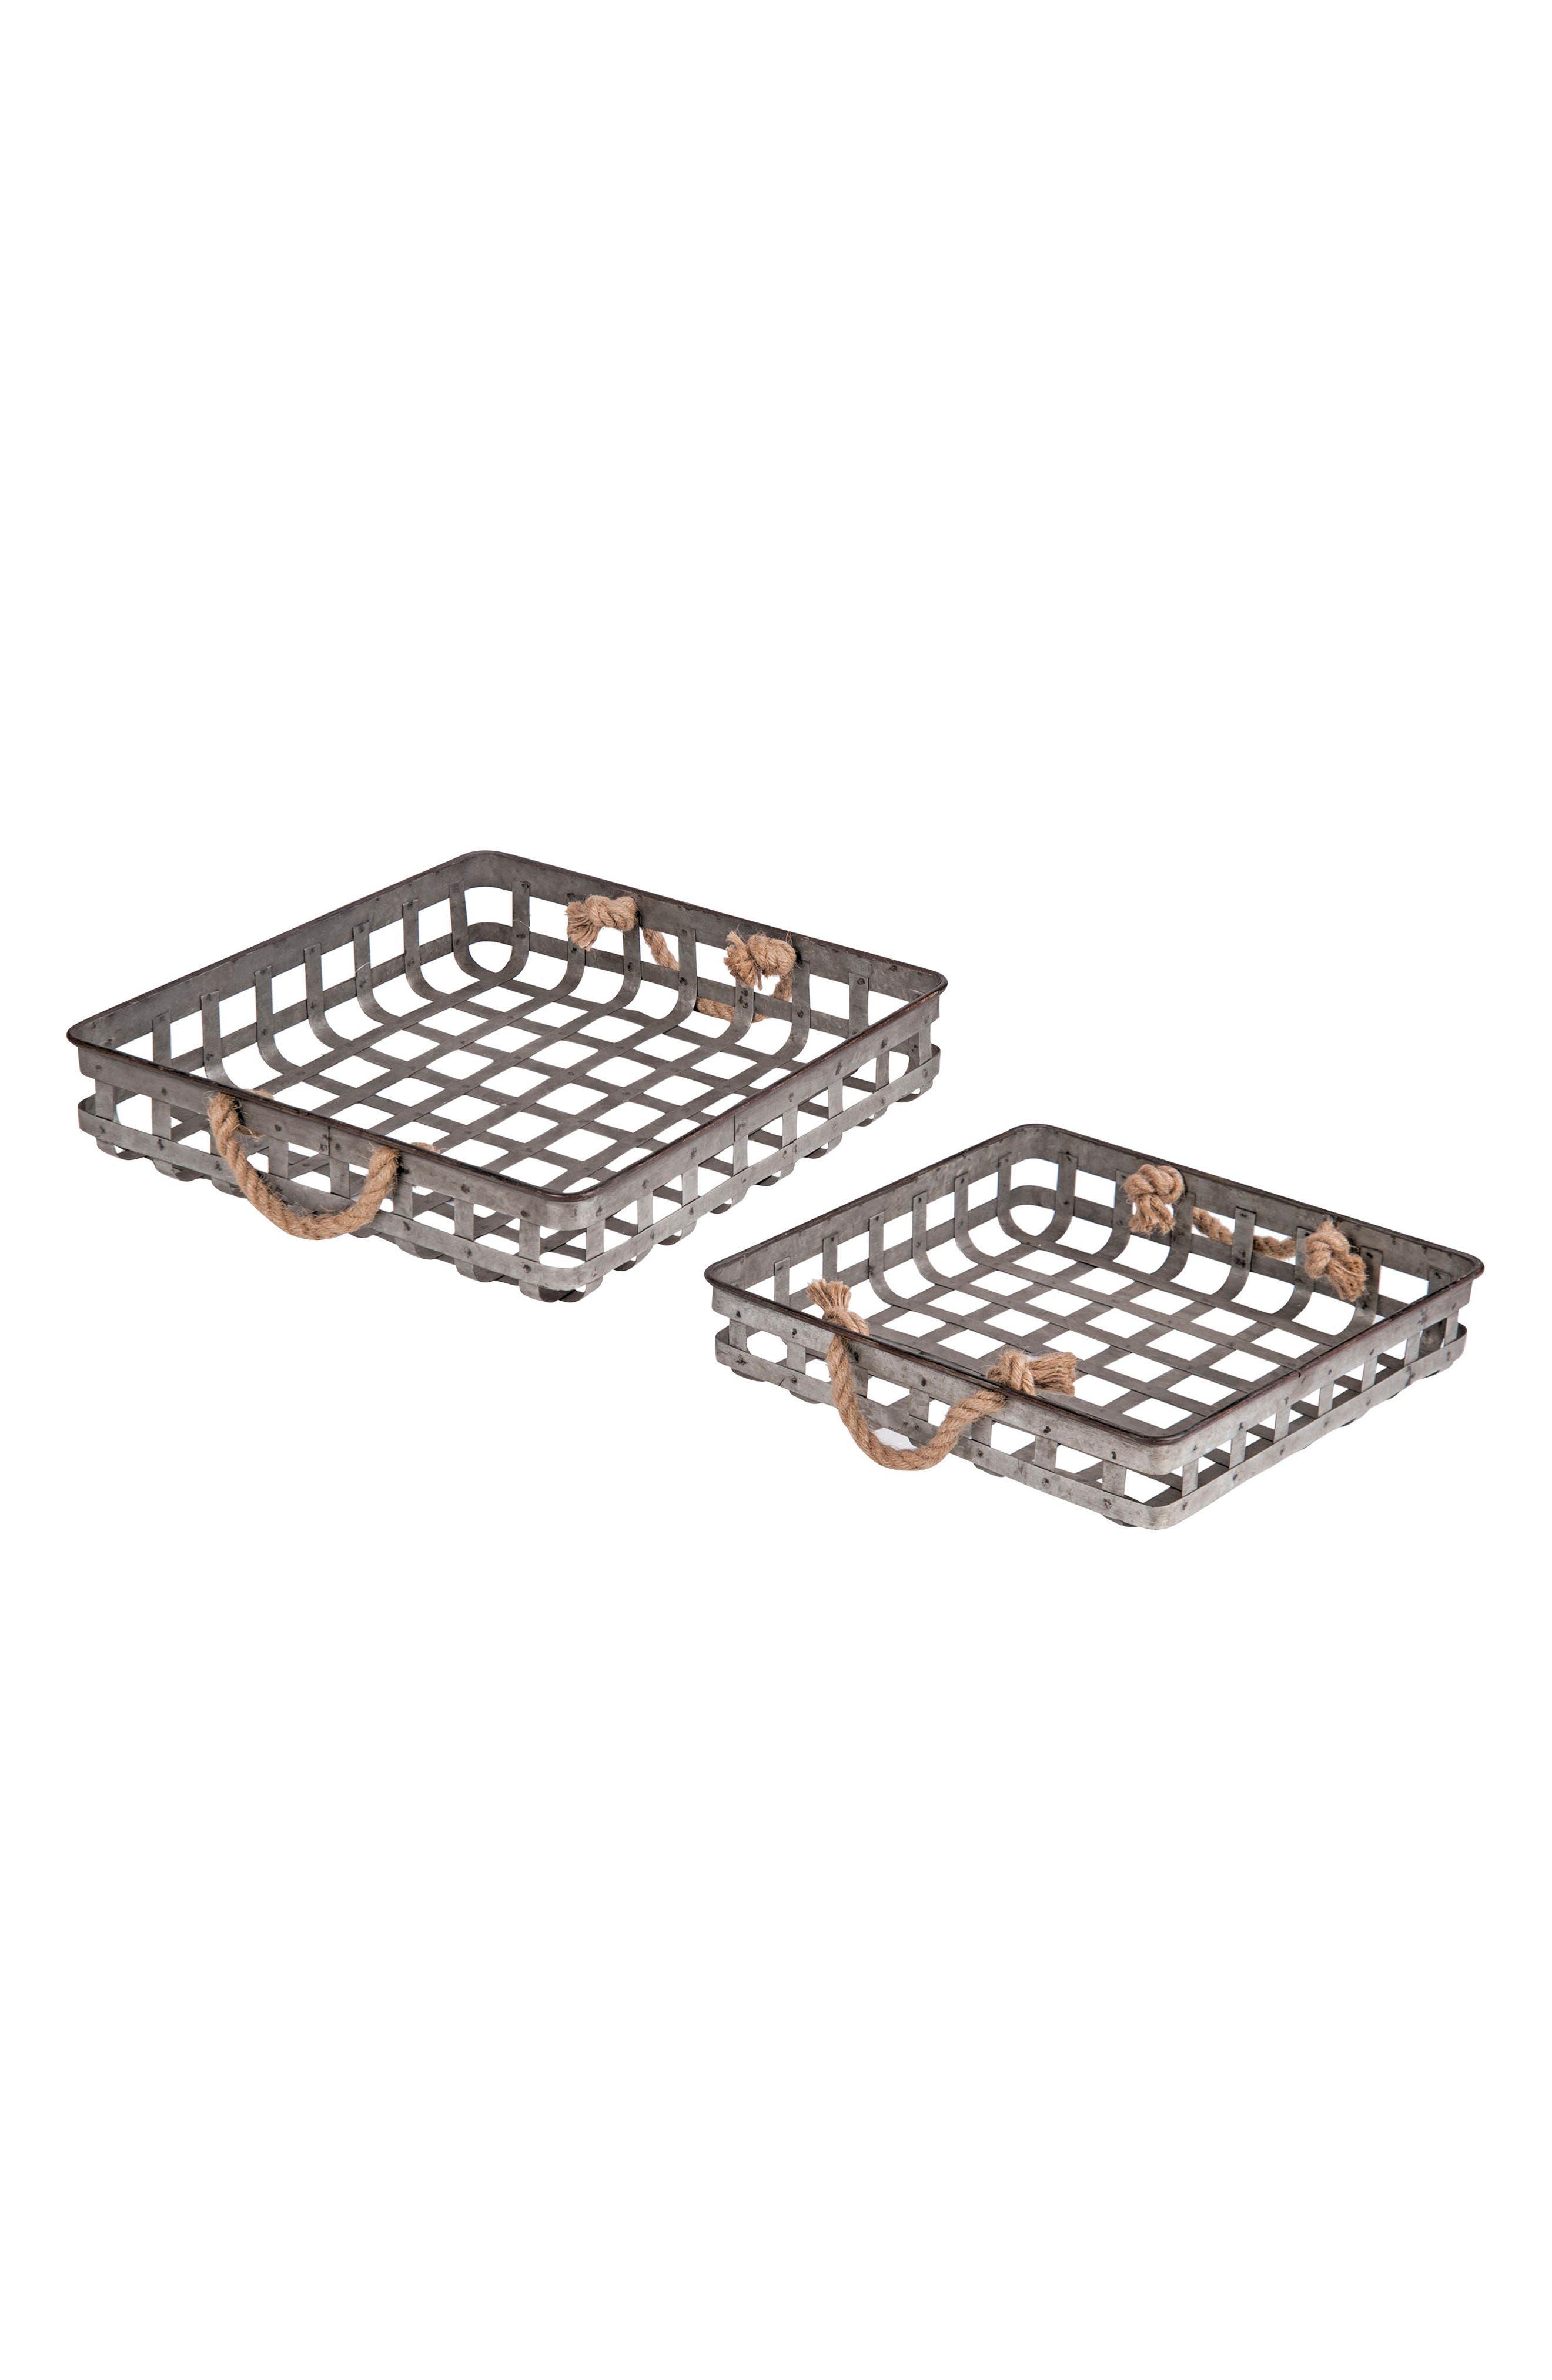 Set of 2 Nesting Basket Trays,                         Main,                         color,